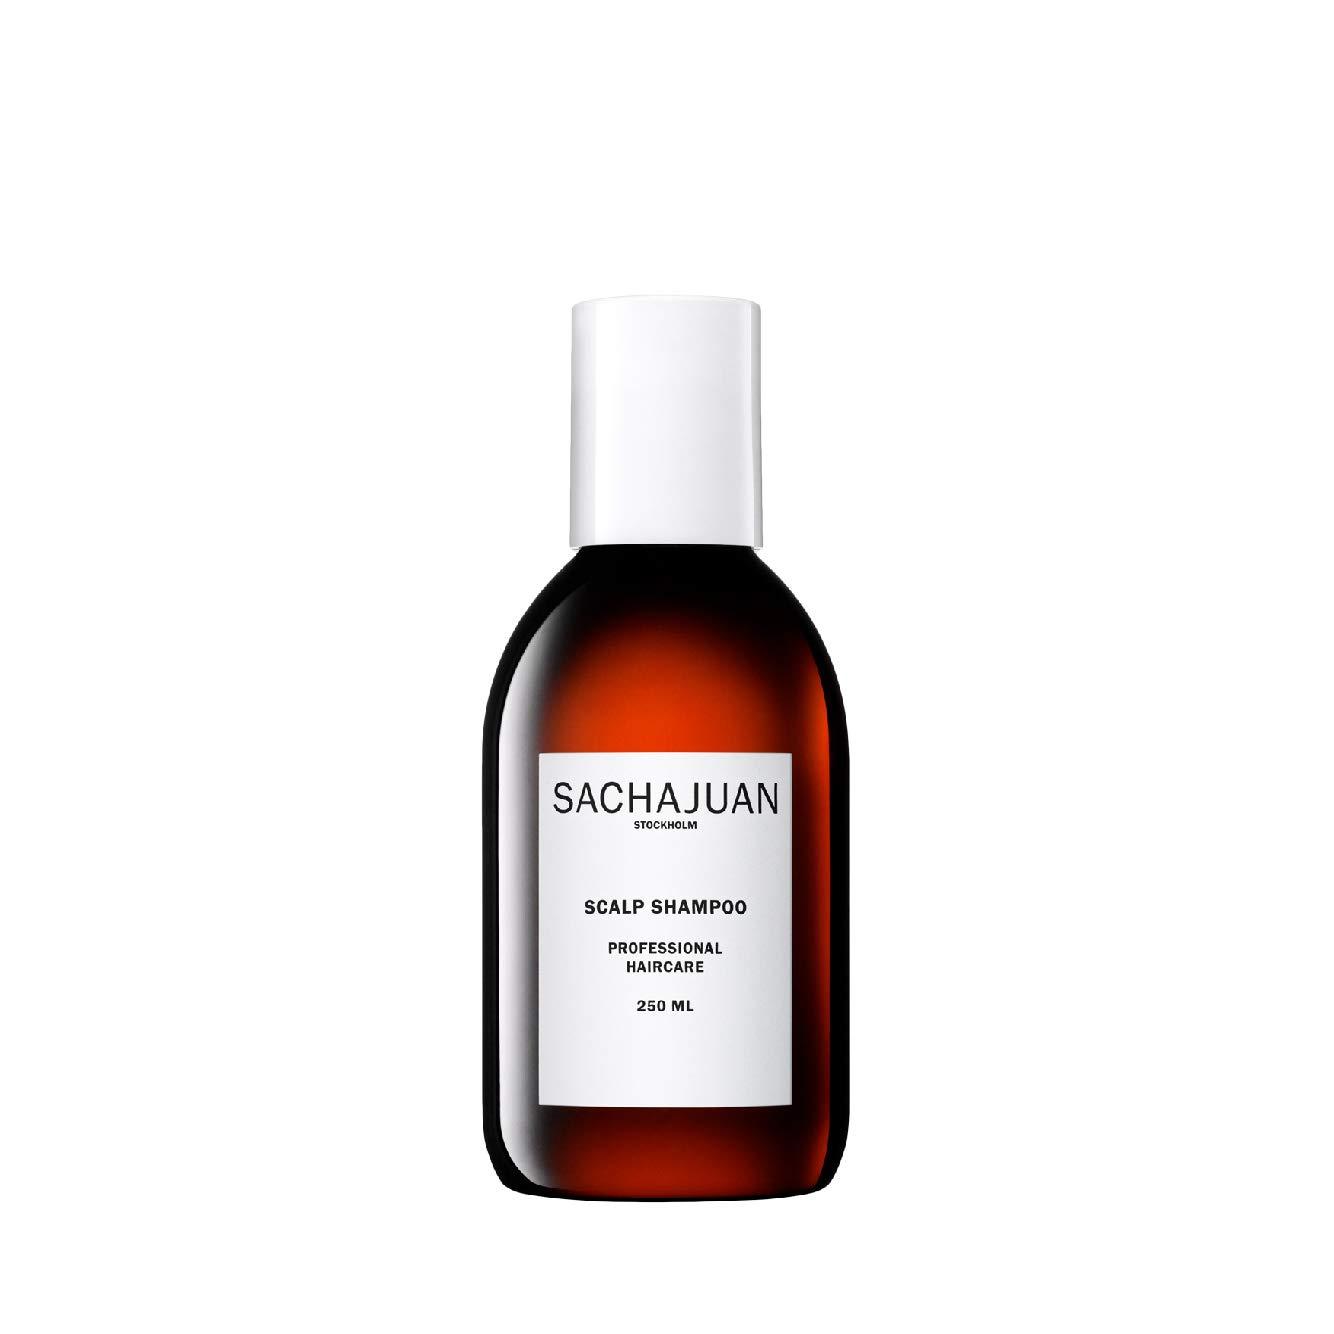 Top 10 Best Dandruff Shampoo for Men (2020 Reviews & Guide) 2